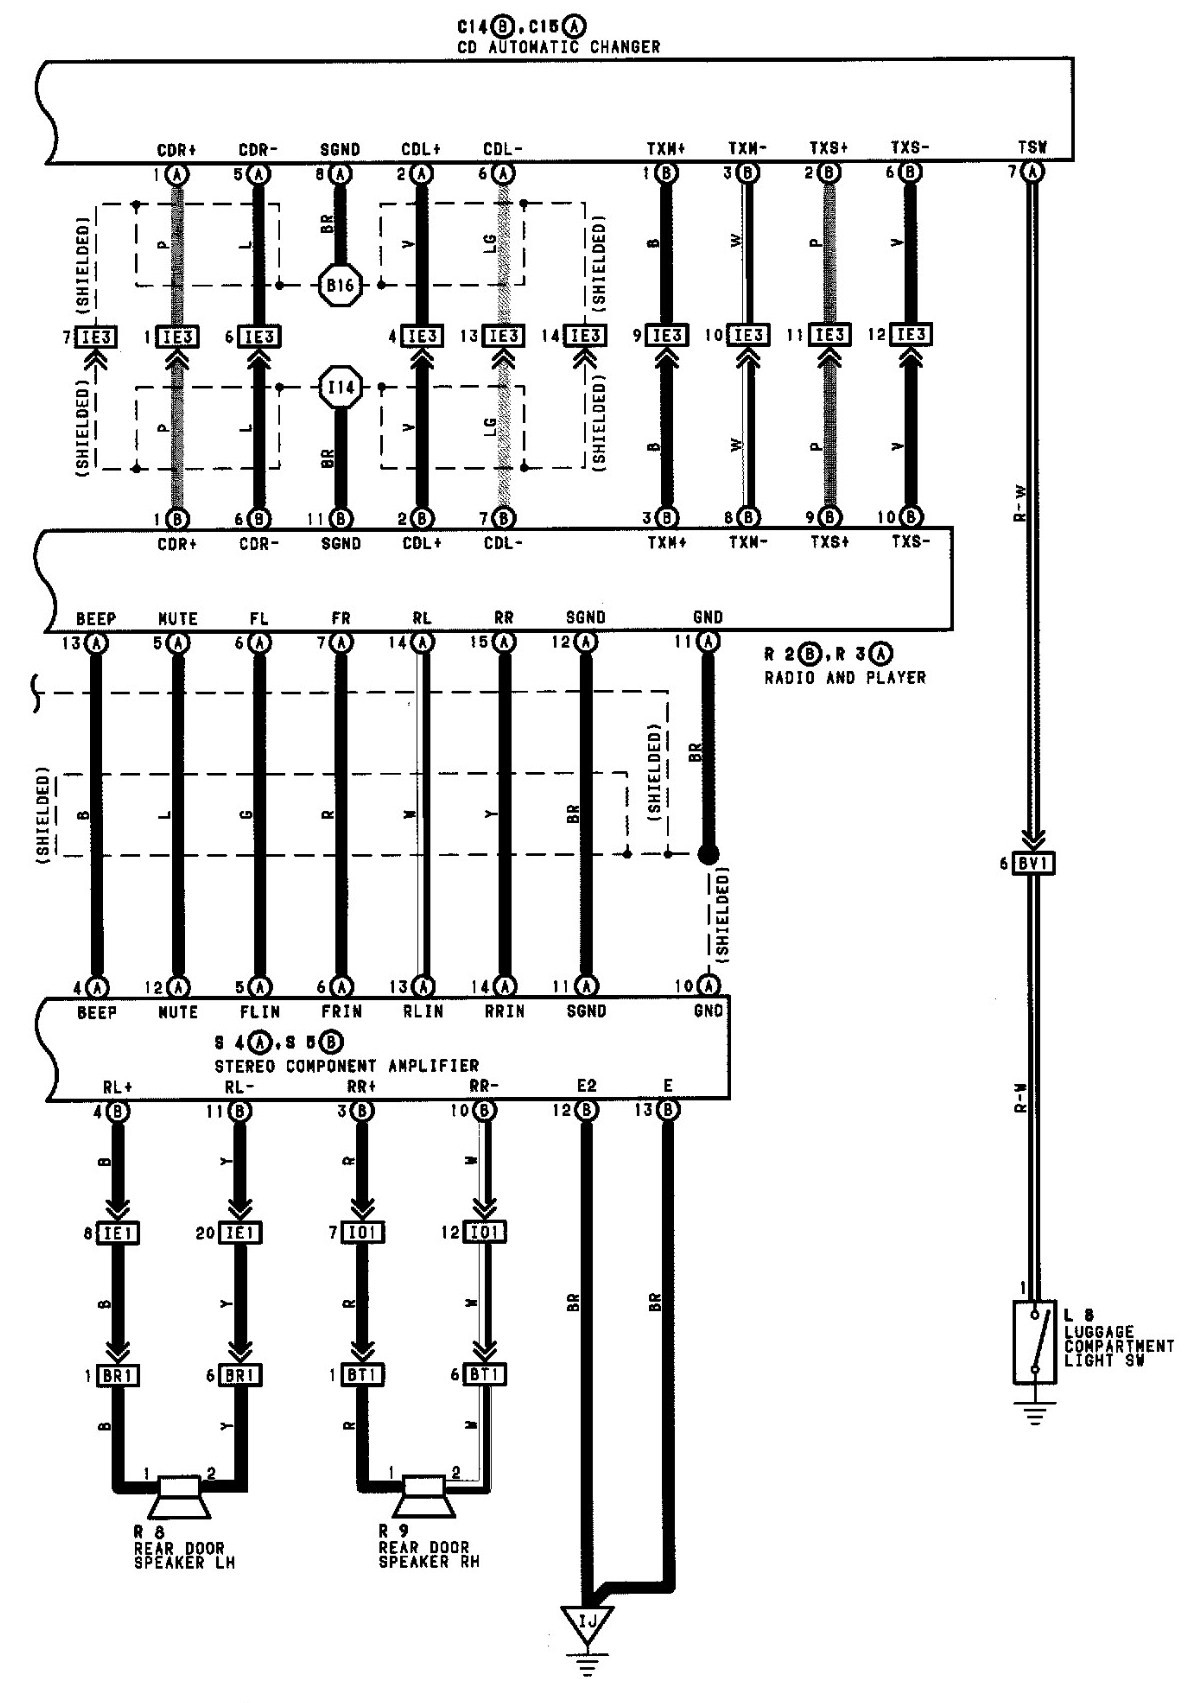 2003 Toyota Camry Wiring Diagram